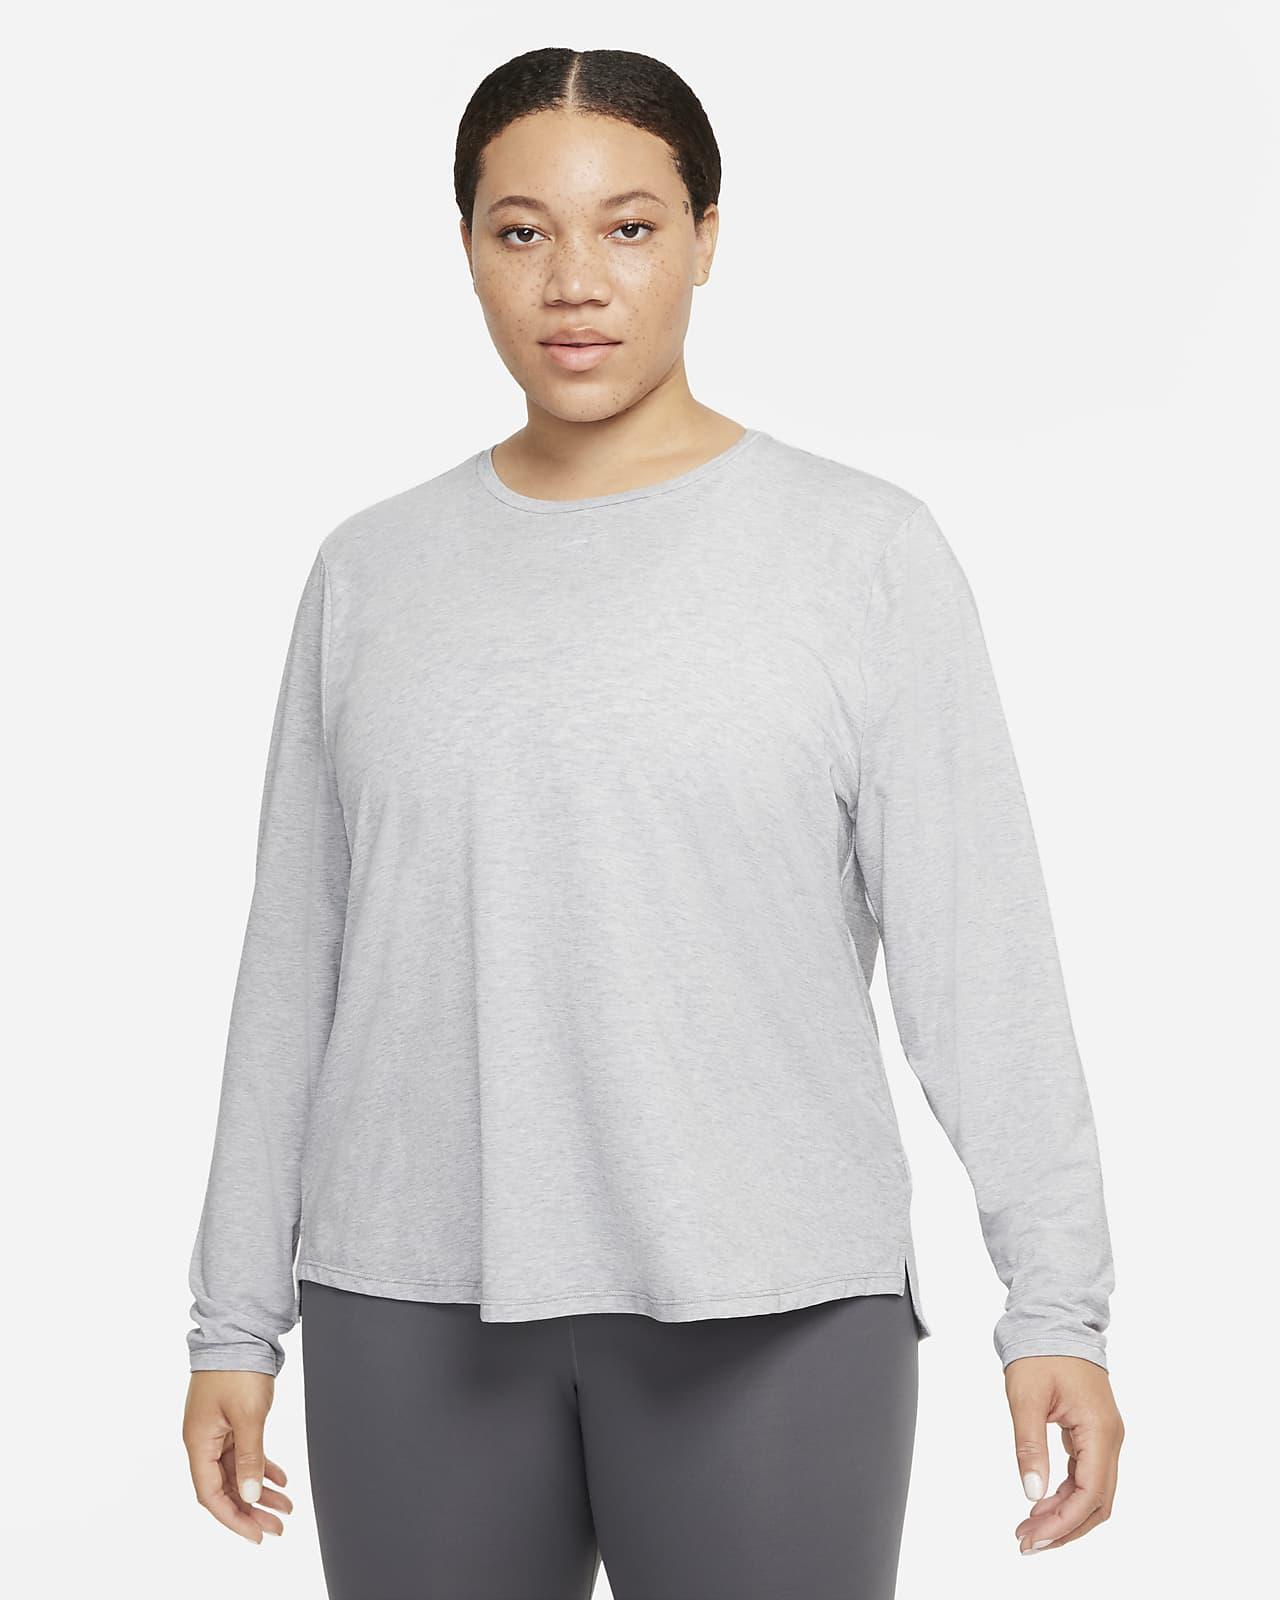 Prenda para la parte superior de manga larga de ajuste estándar para mujer Nike Dri-FIT One Luxe (talla grande)